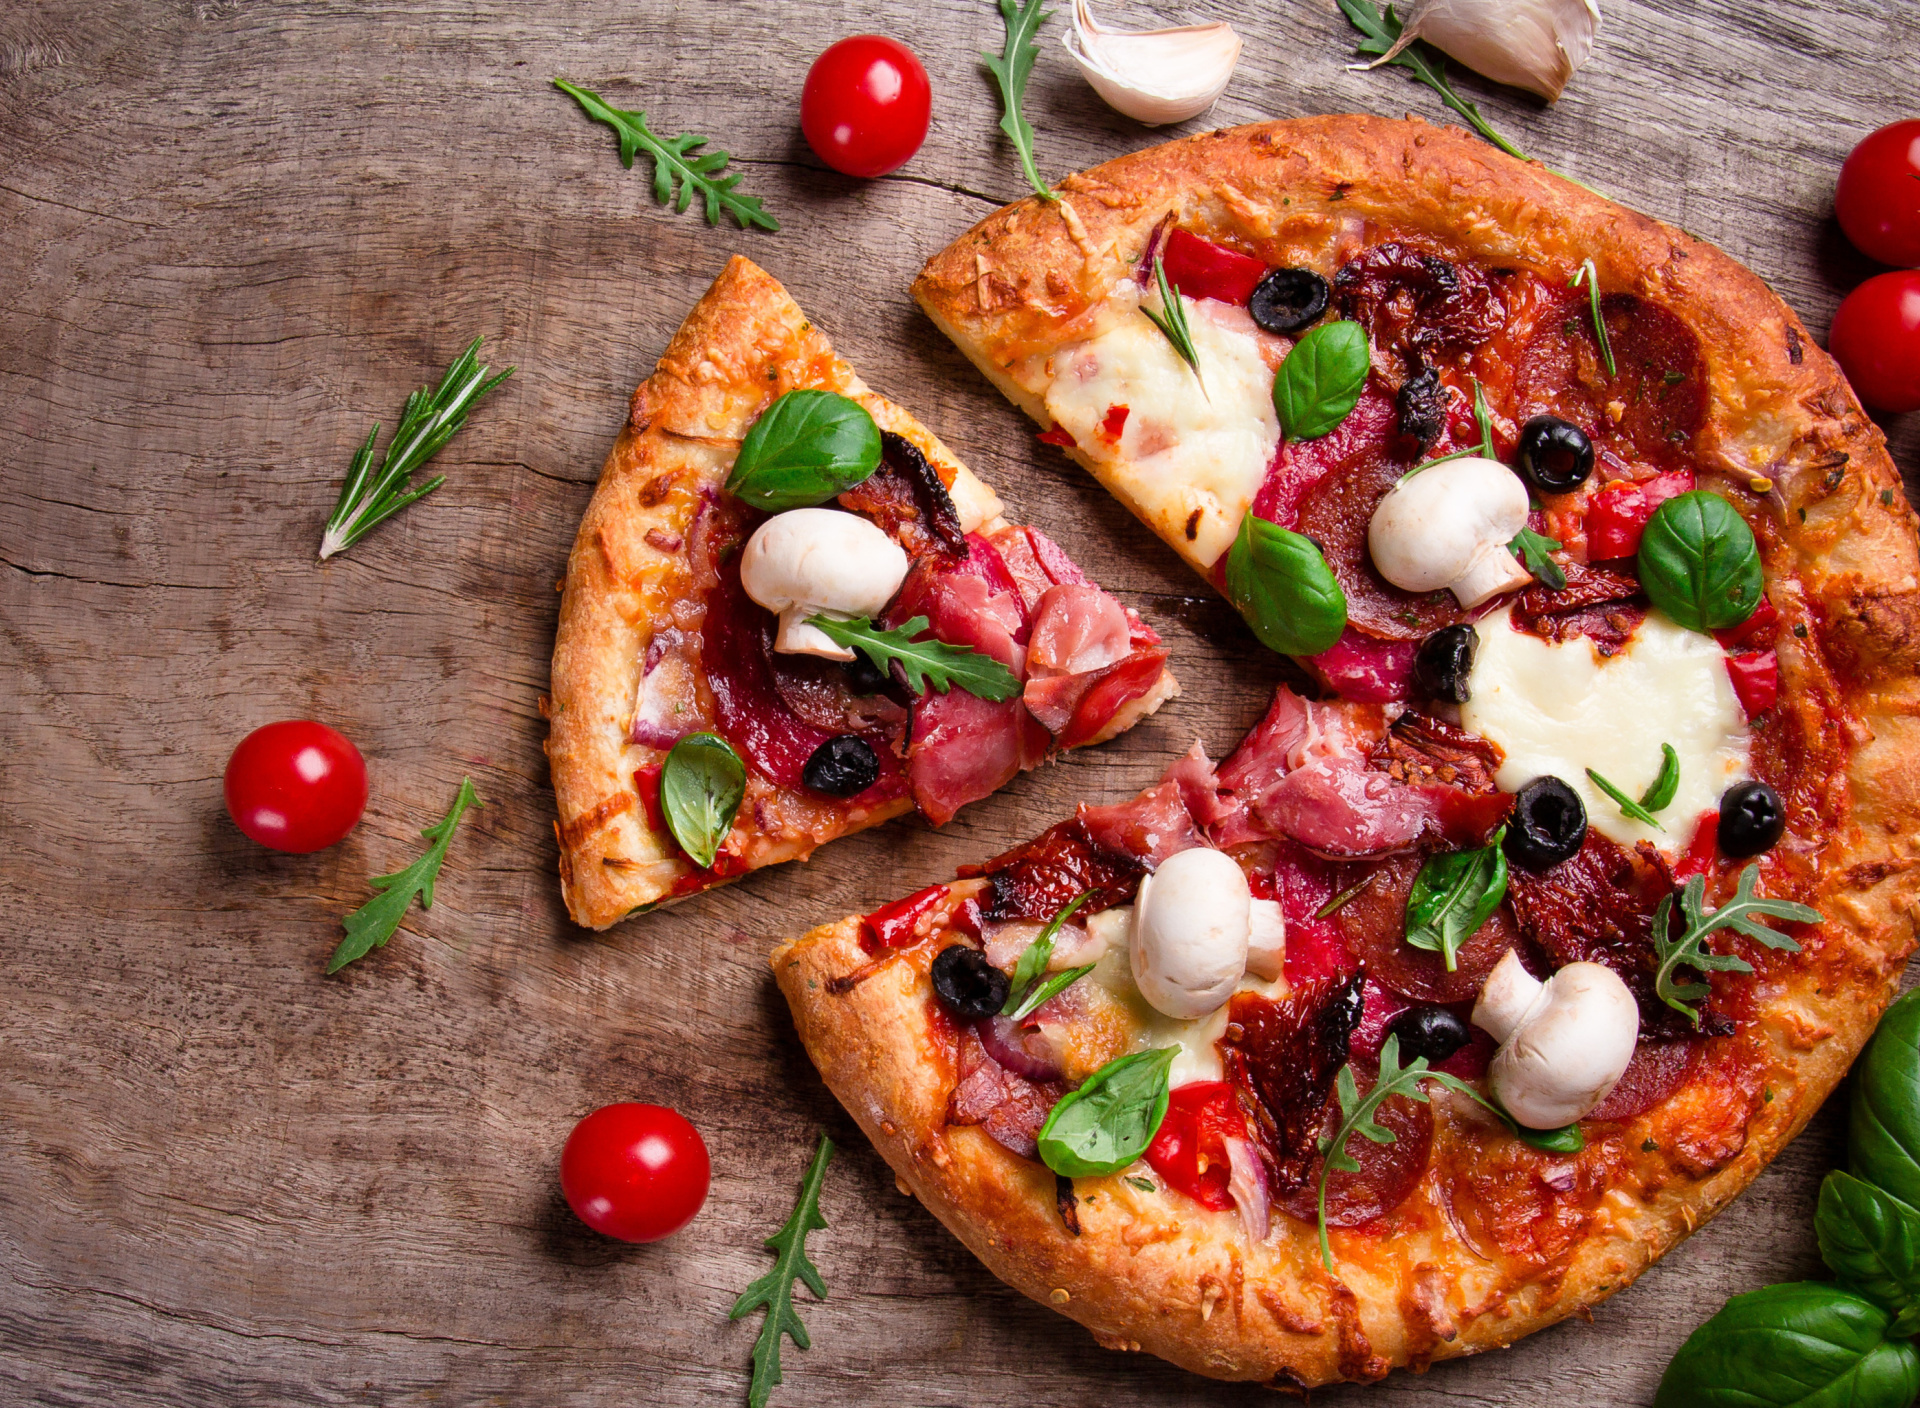 Картинки аву, крутые картинки пицца